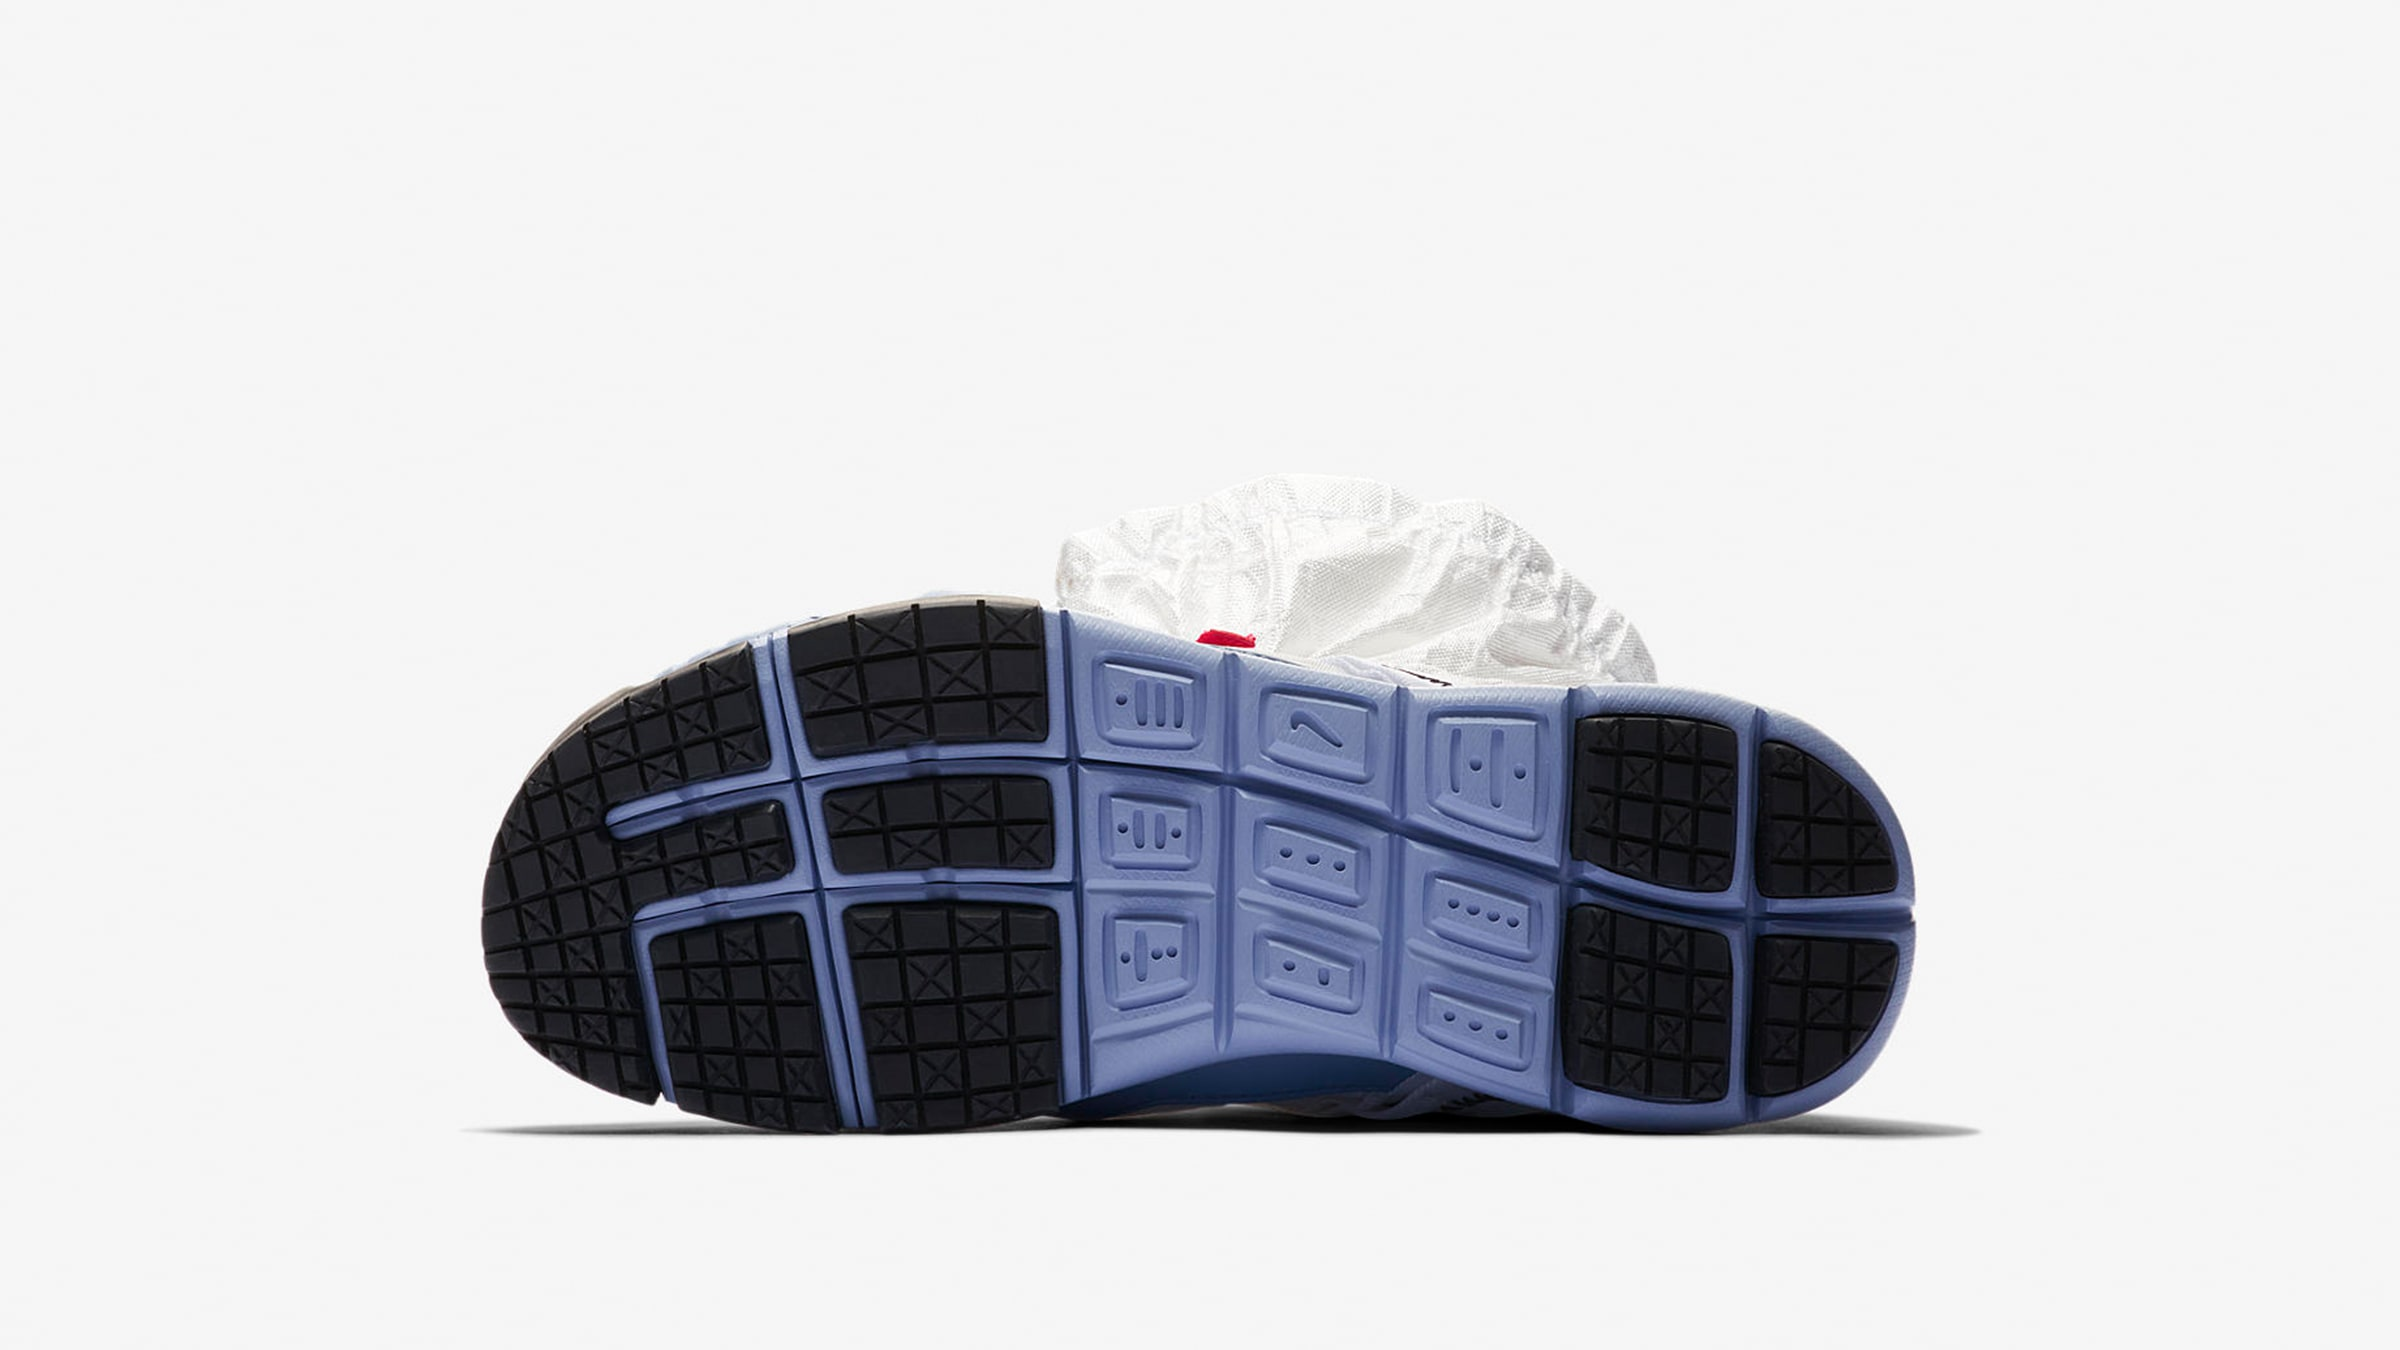 b226aaafeee Nike Mars Yard Overshoe - Register Now on END. Launches